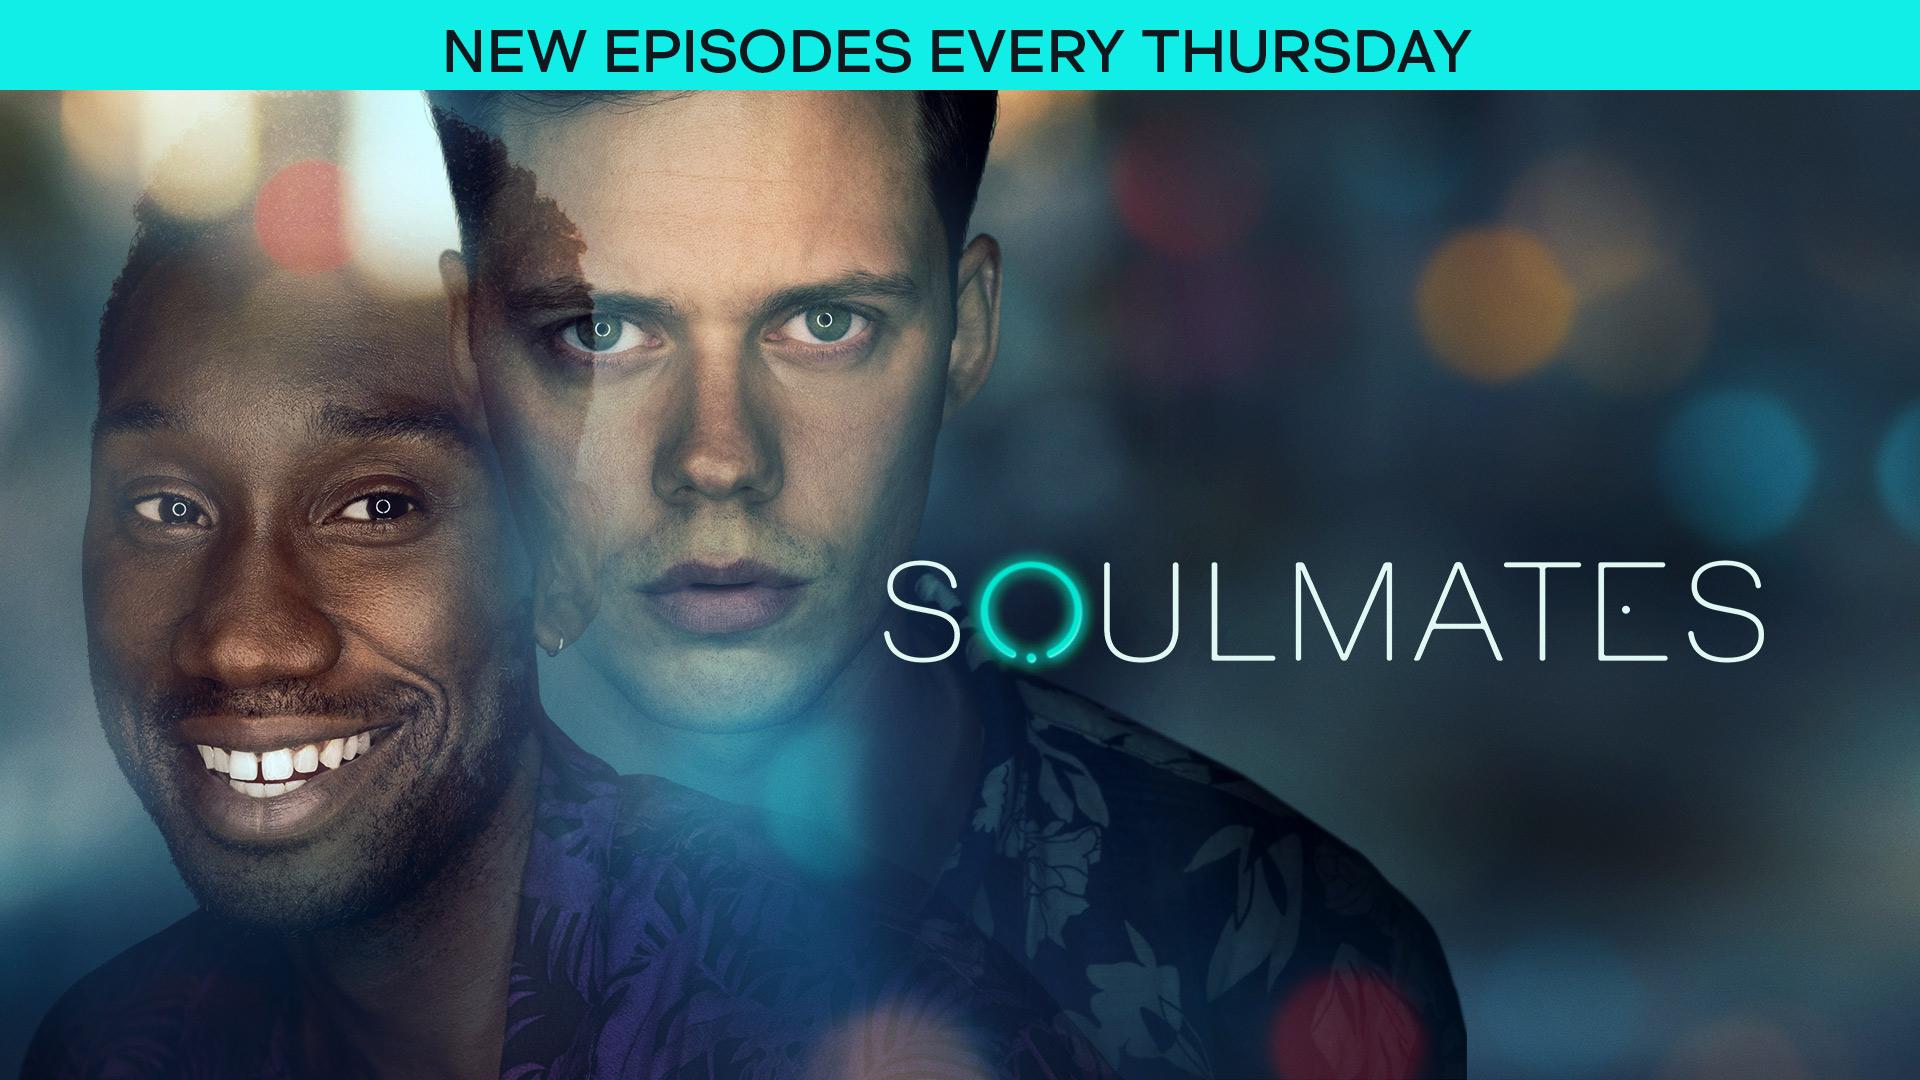 Soulmates, Season 1